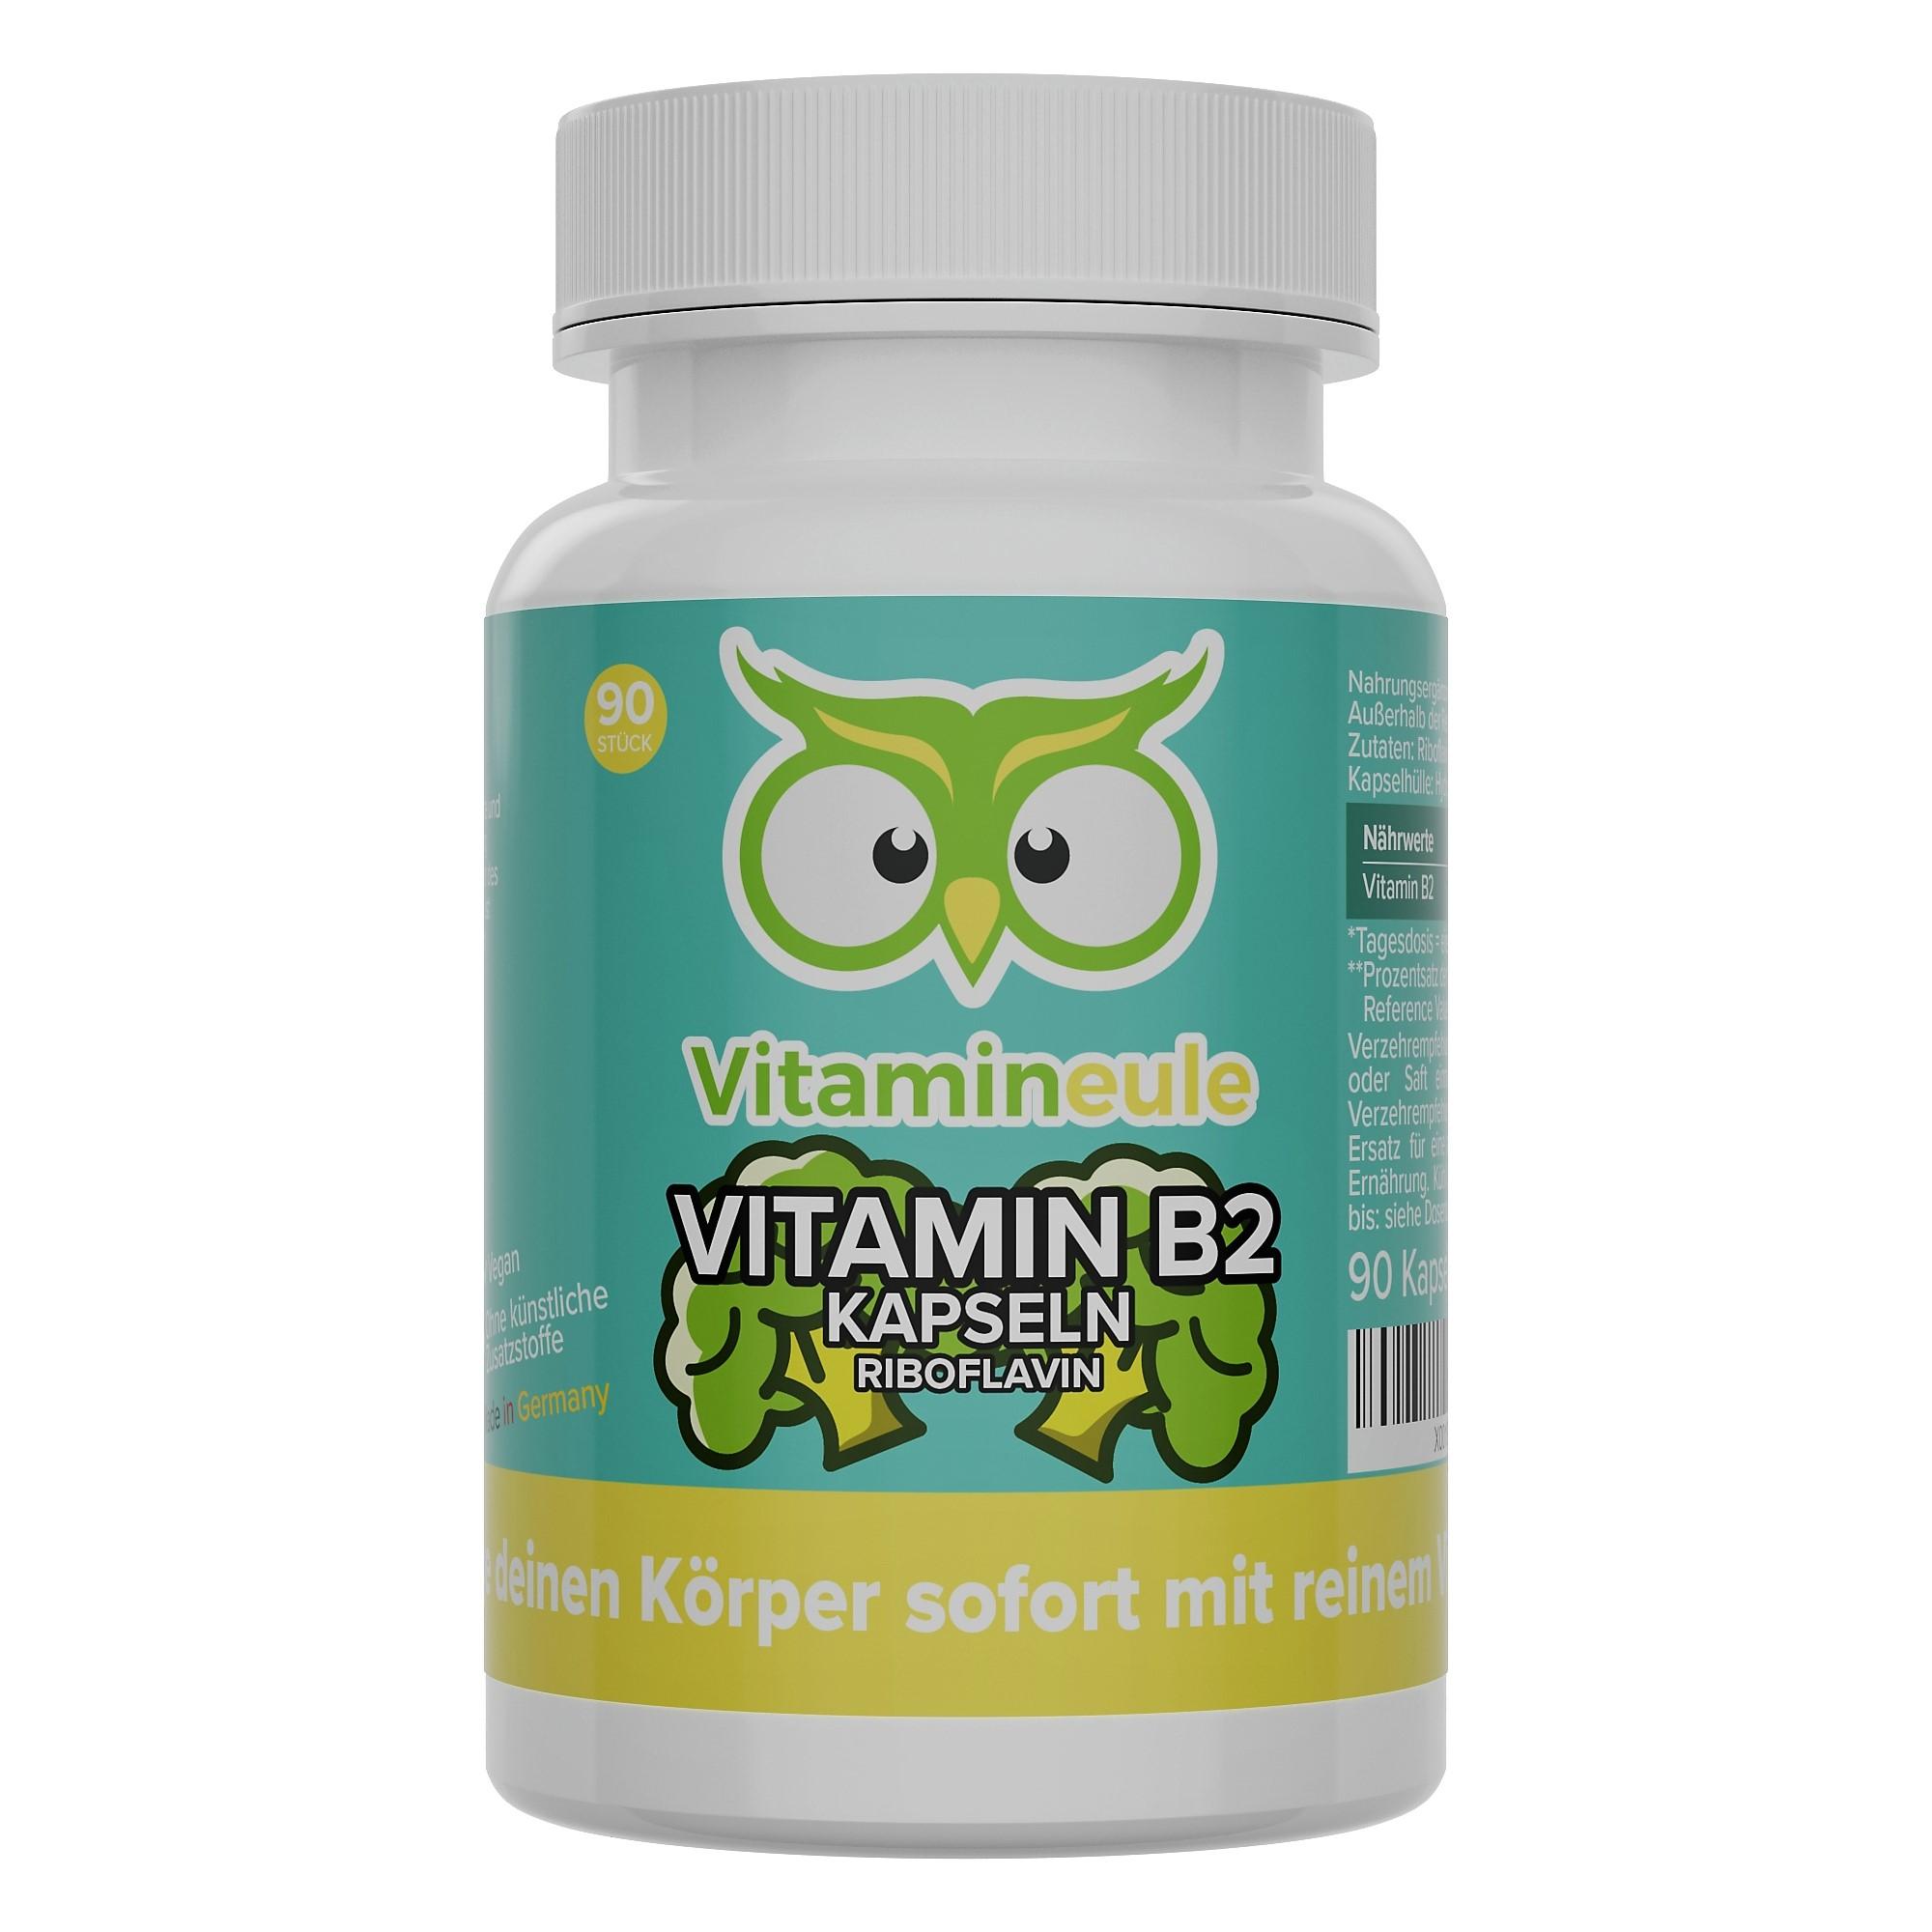 Vitamin B2 Kapseln von Vitamineule